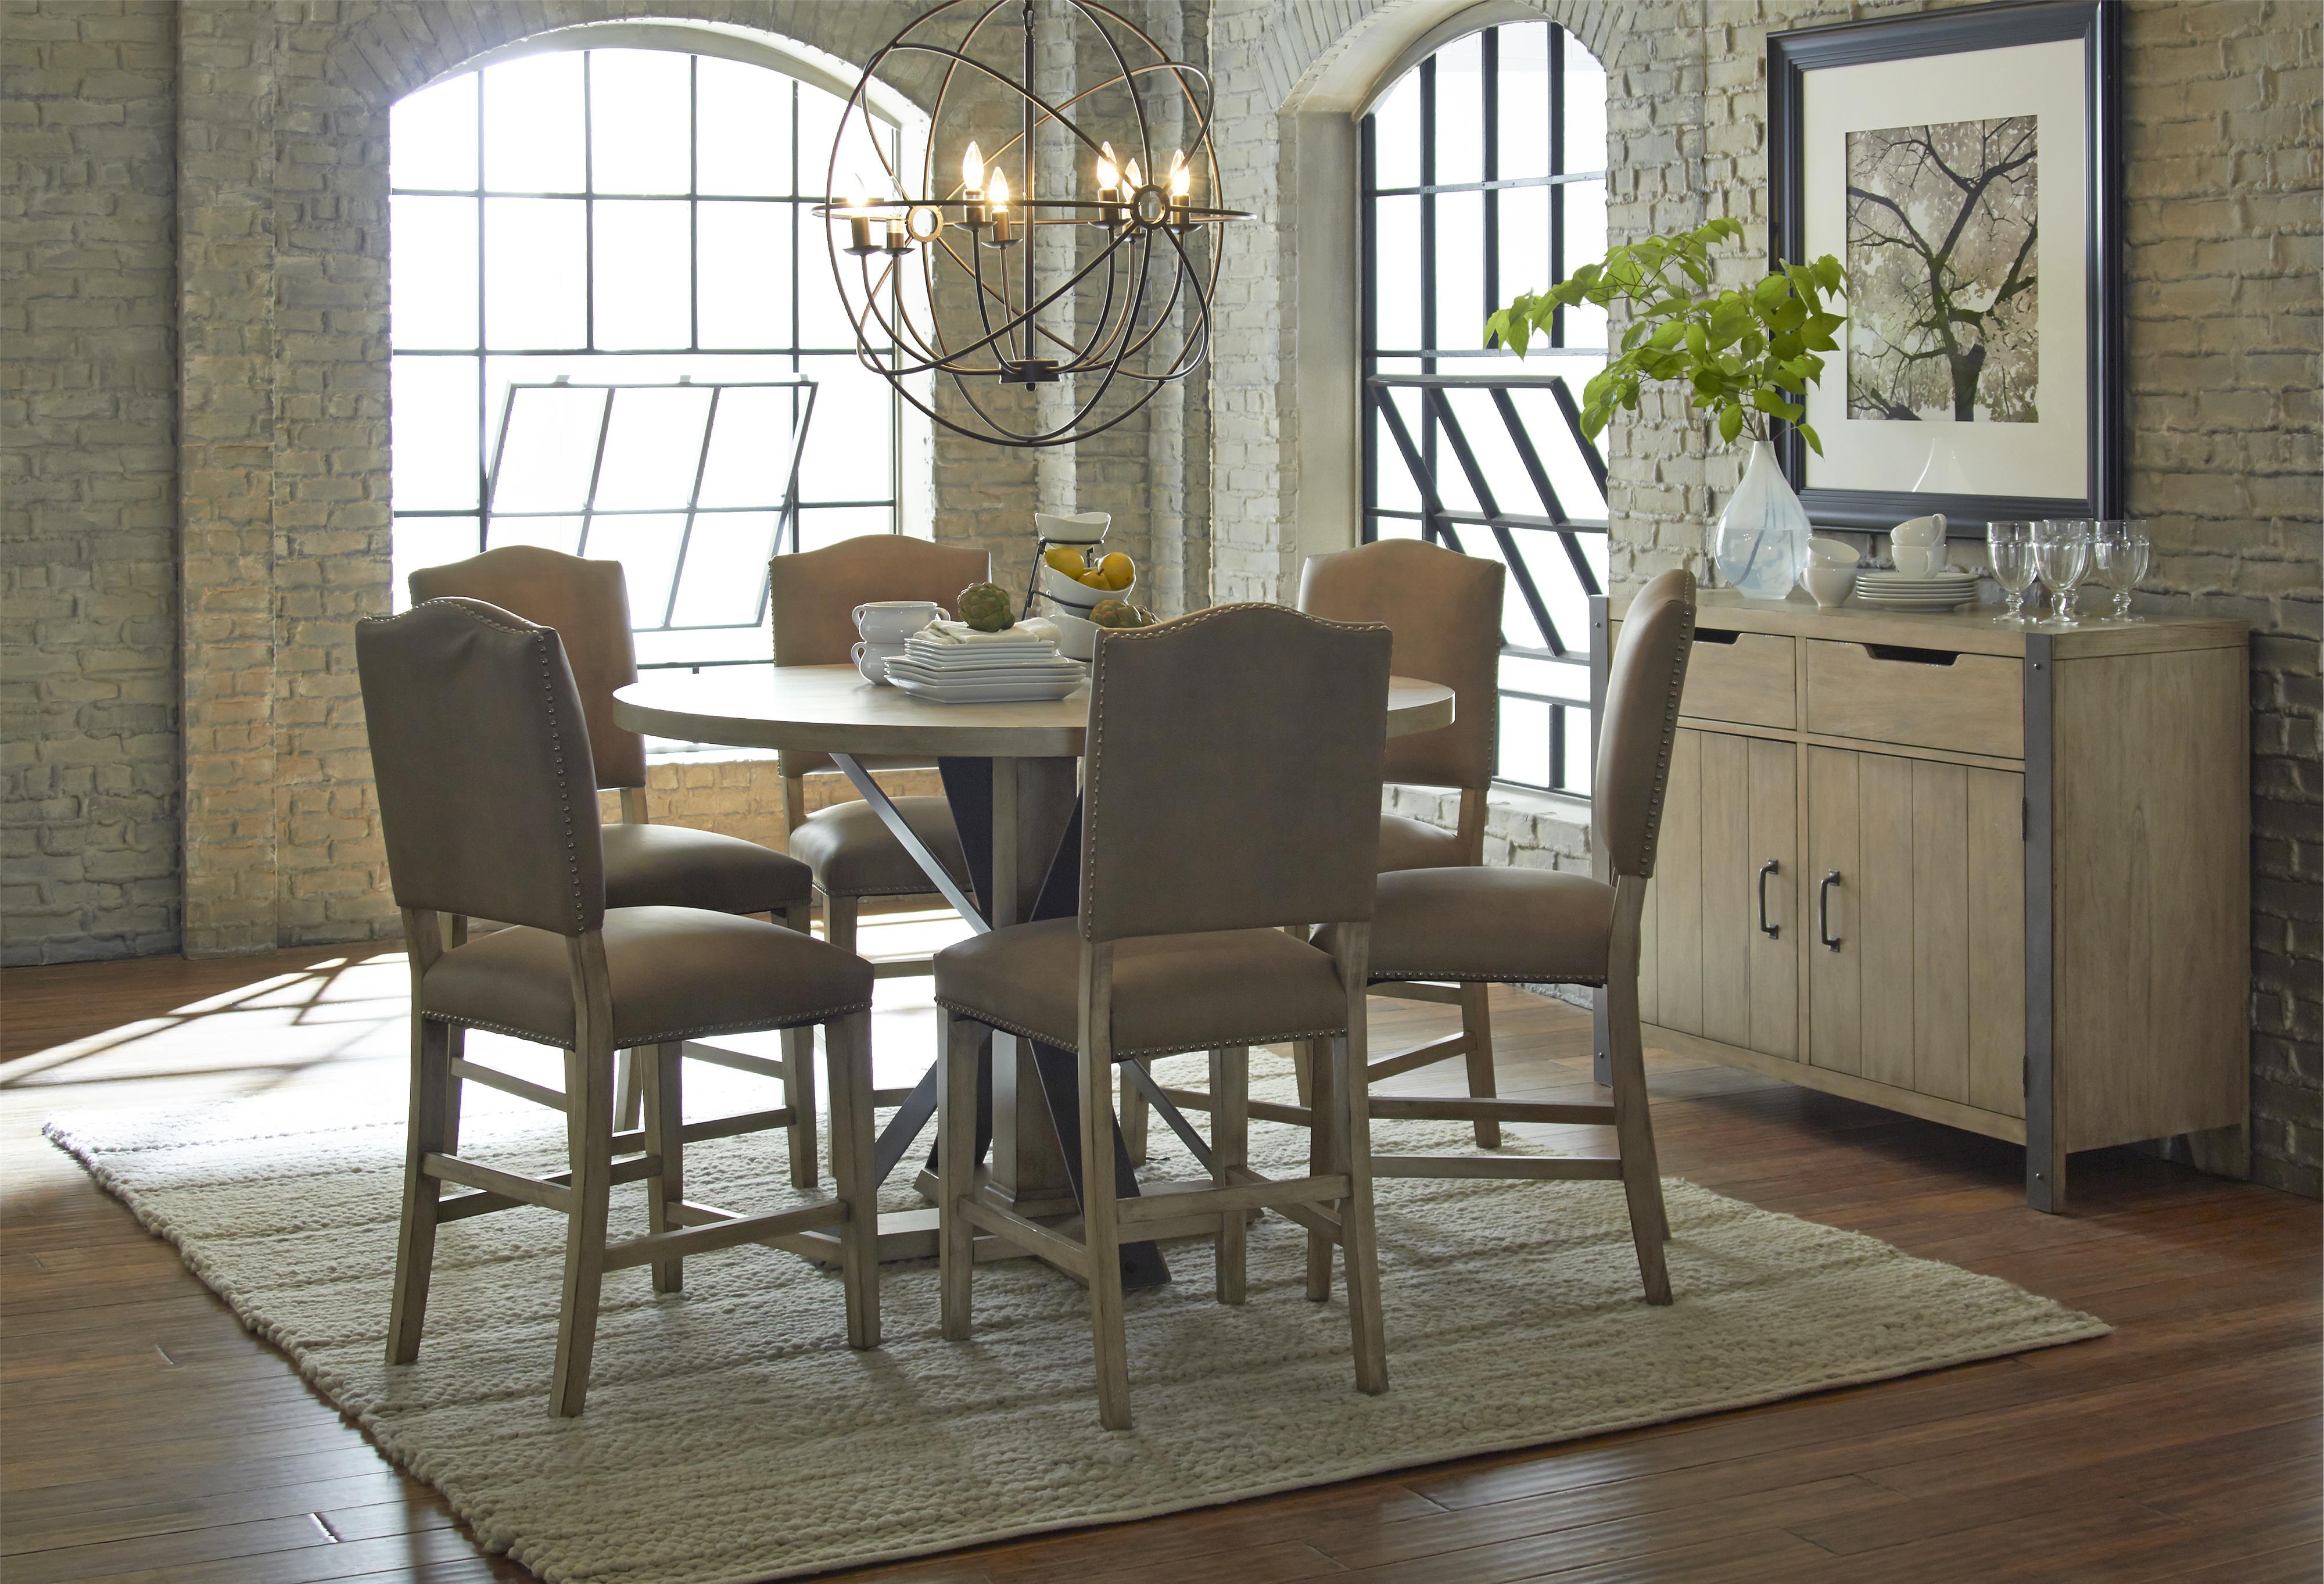 Progressive Furniture Shenandoah Casual Dining Room Group - Item Number: P870-12+6x63+83